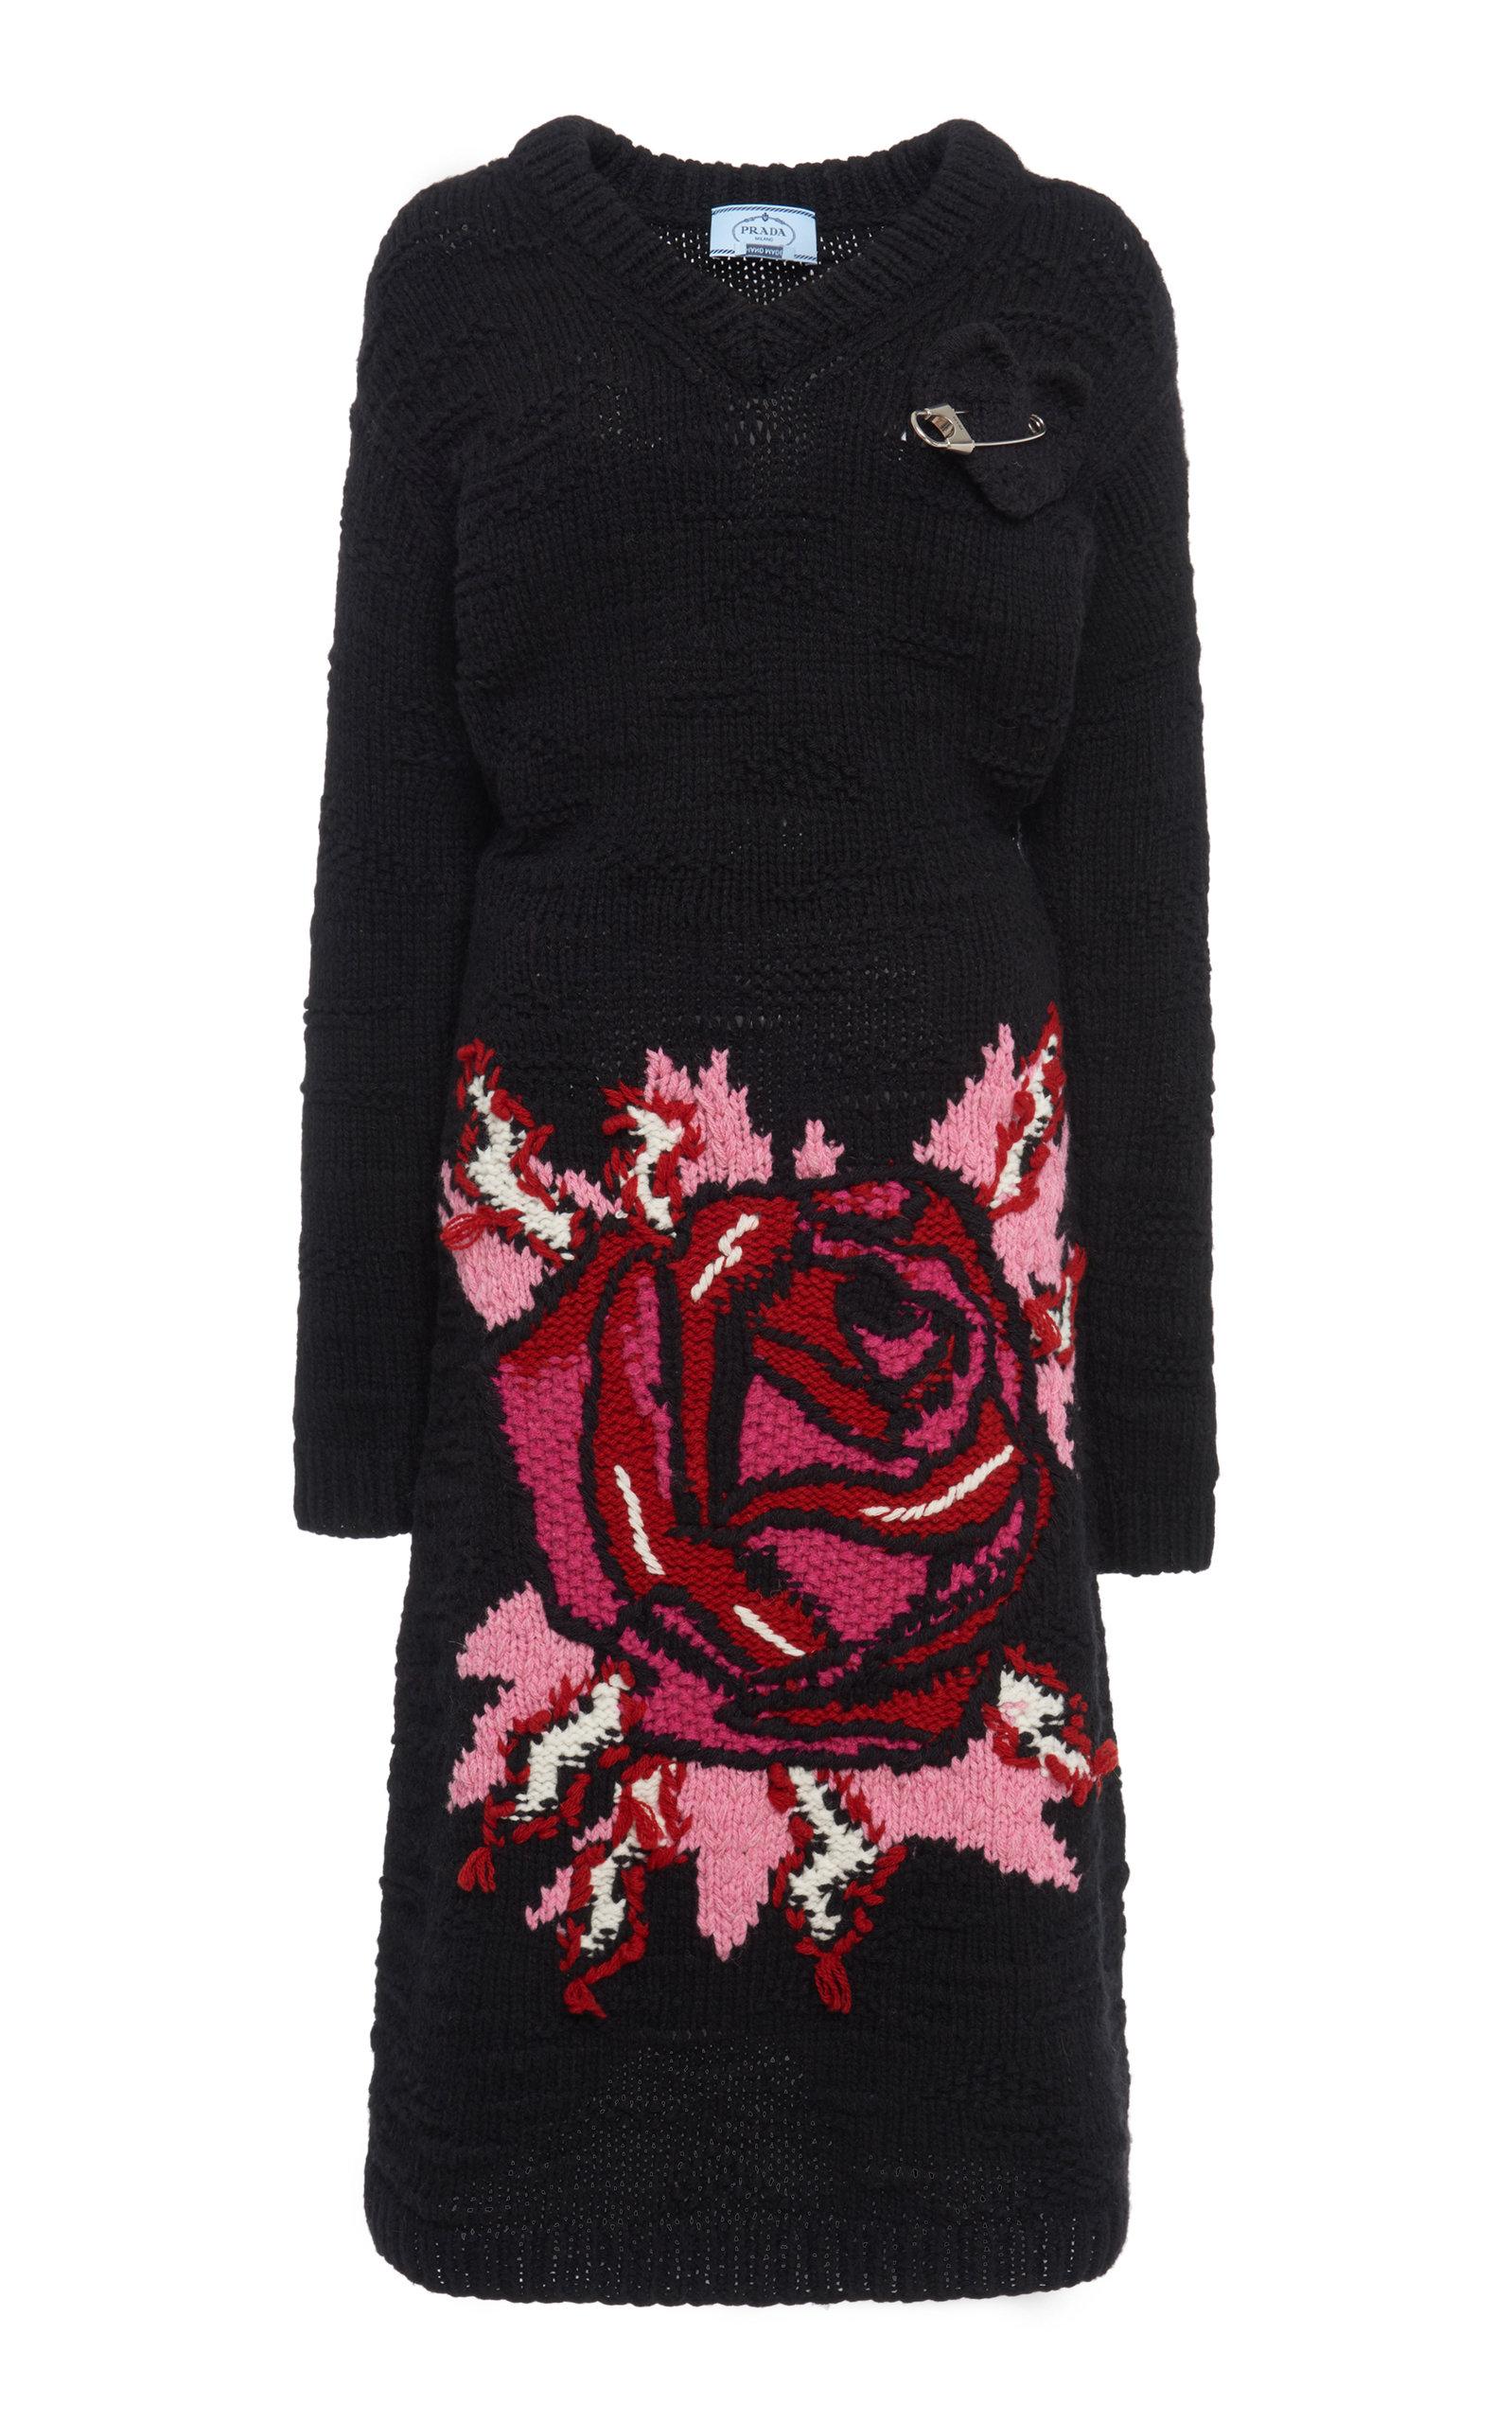 Buy Prada Embellished Intarsia-Knit Wool Midi Dress online, shop Prada at the best price